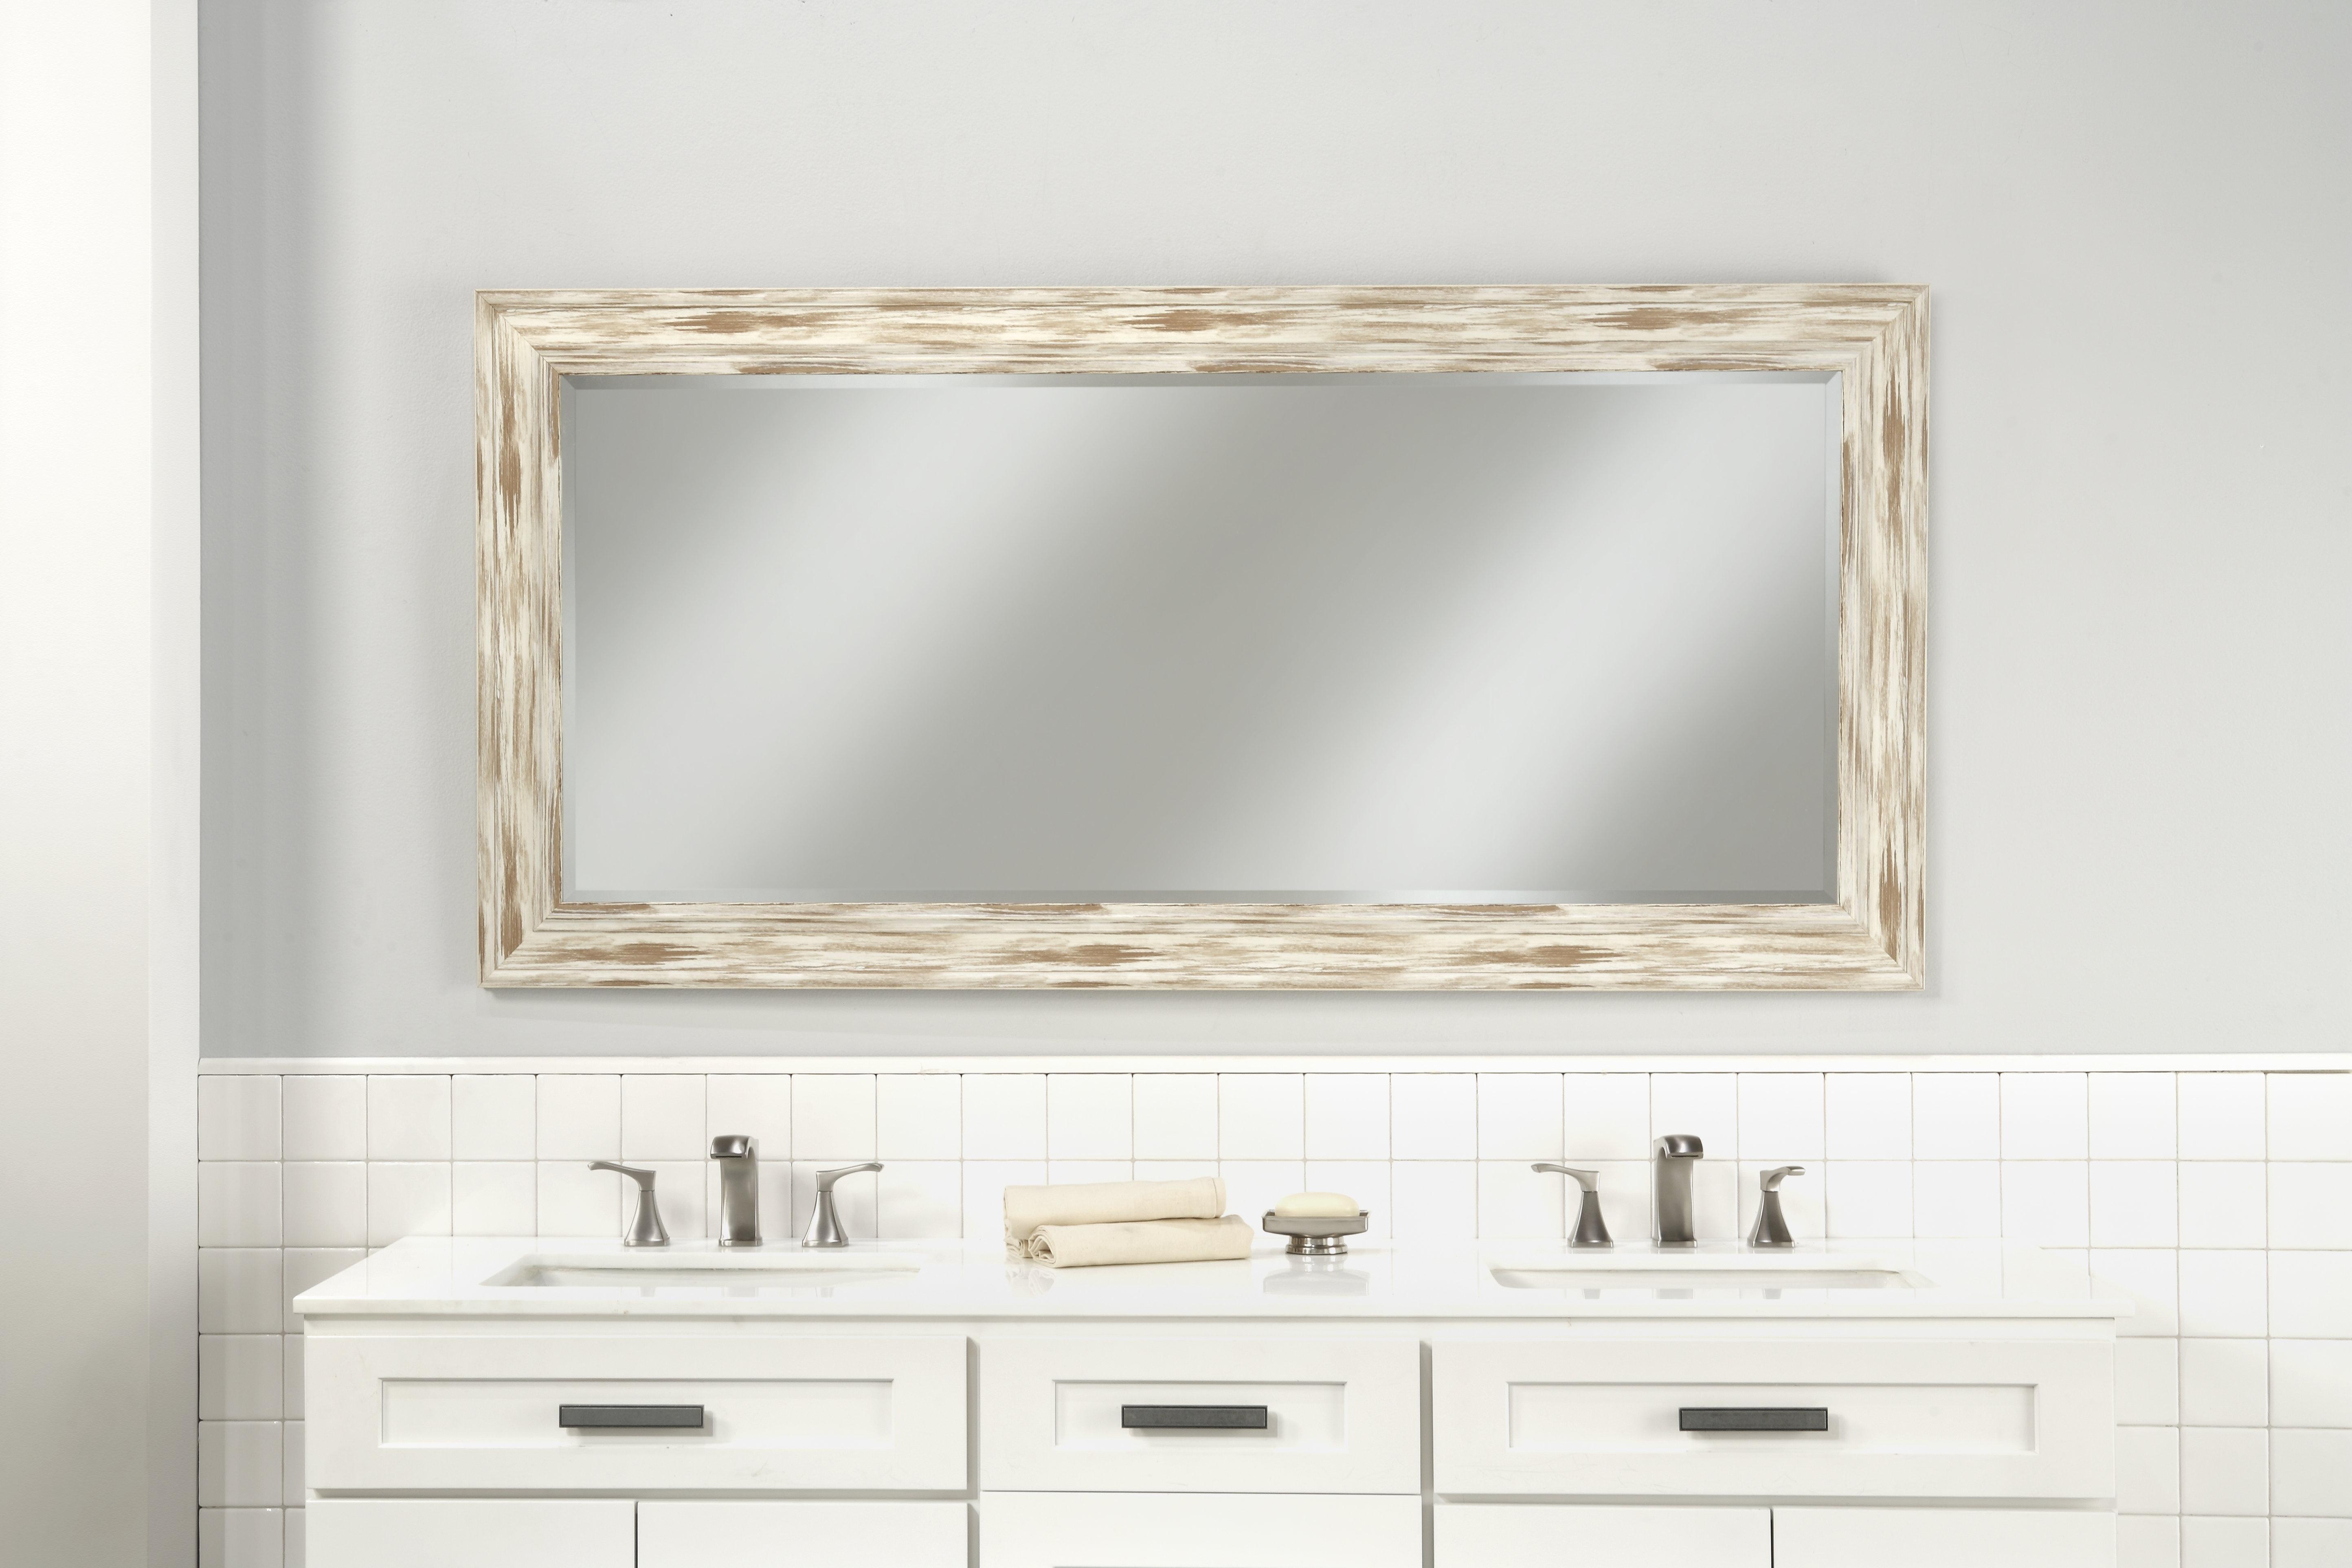 Somerton Bathroom/vanity Mirror Regarding Landover Rustic Distressed Bathroom/vanity Mirrors (Image 19 of 20)